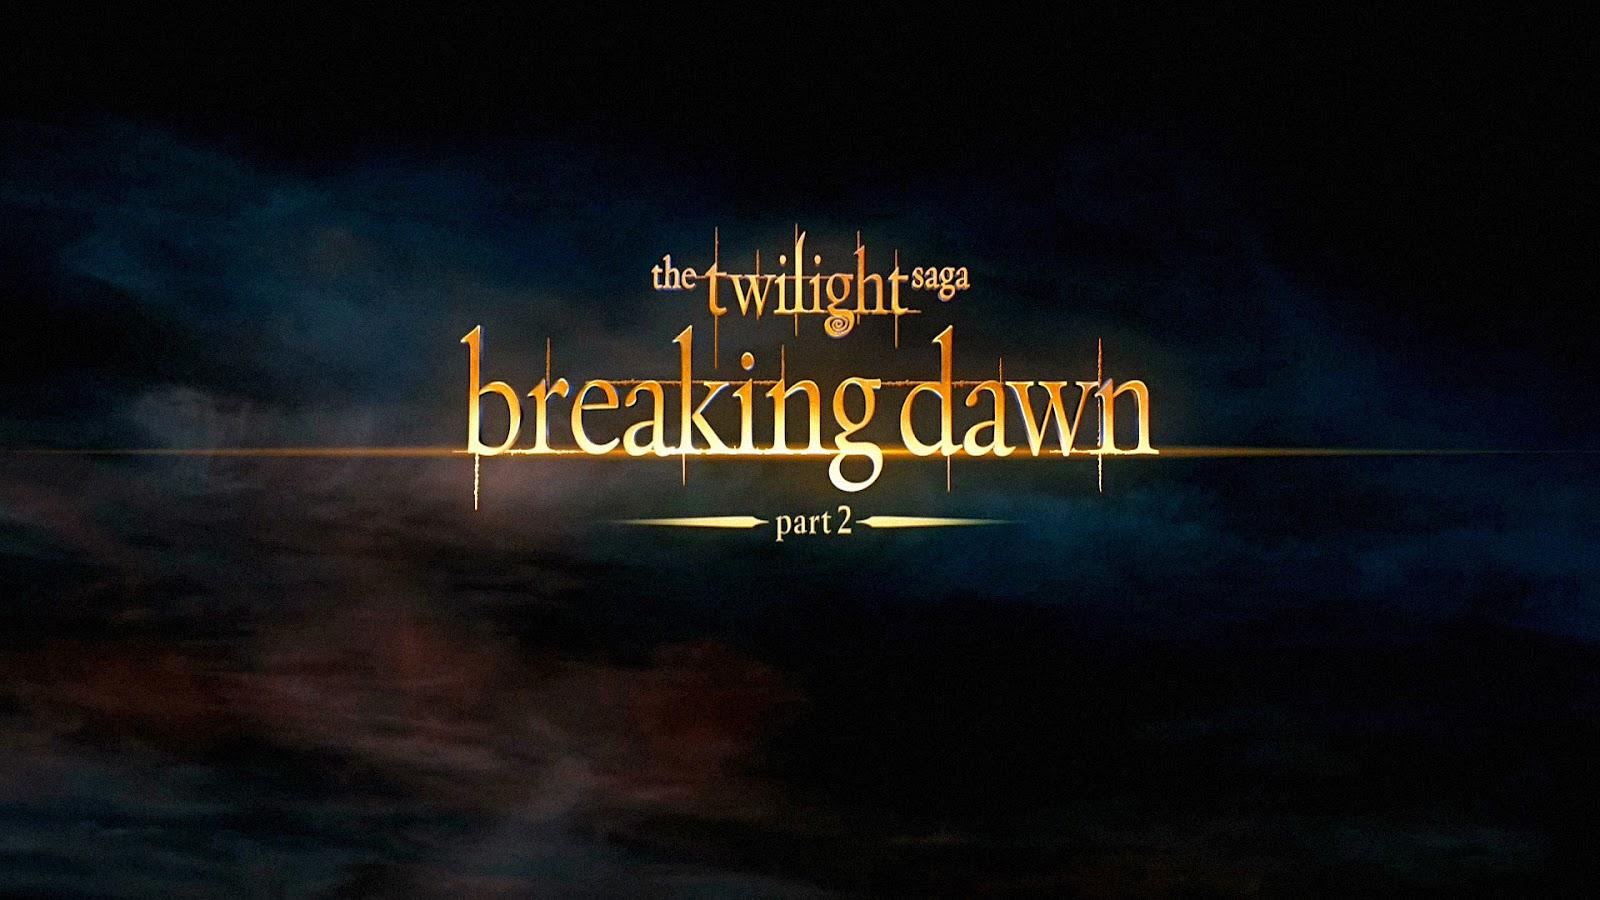 wallpaper movie the twilight saga for pc